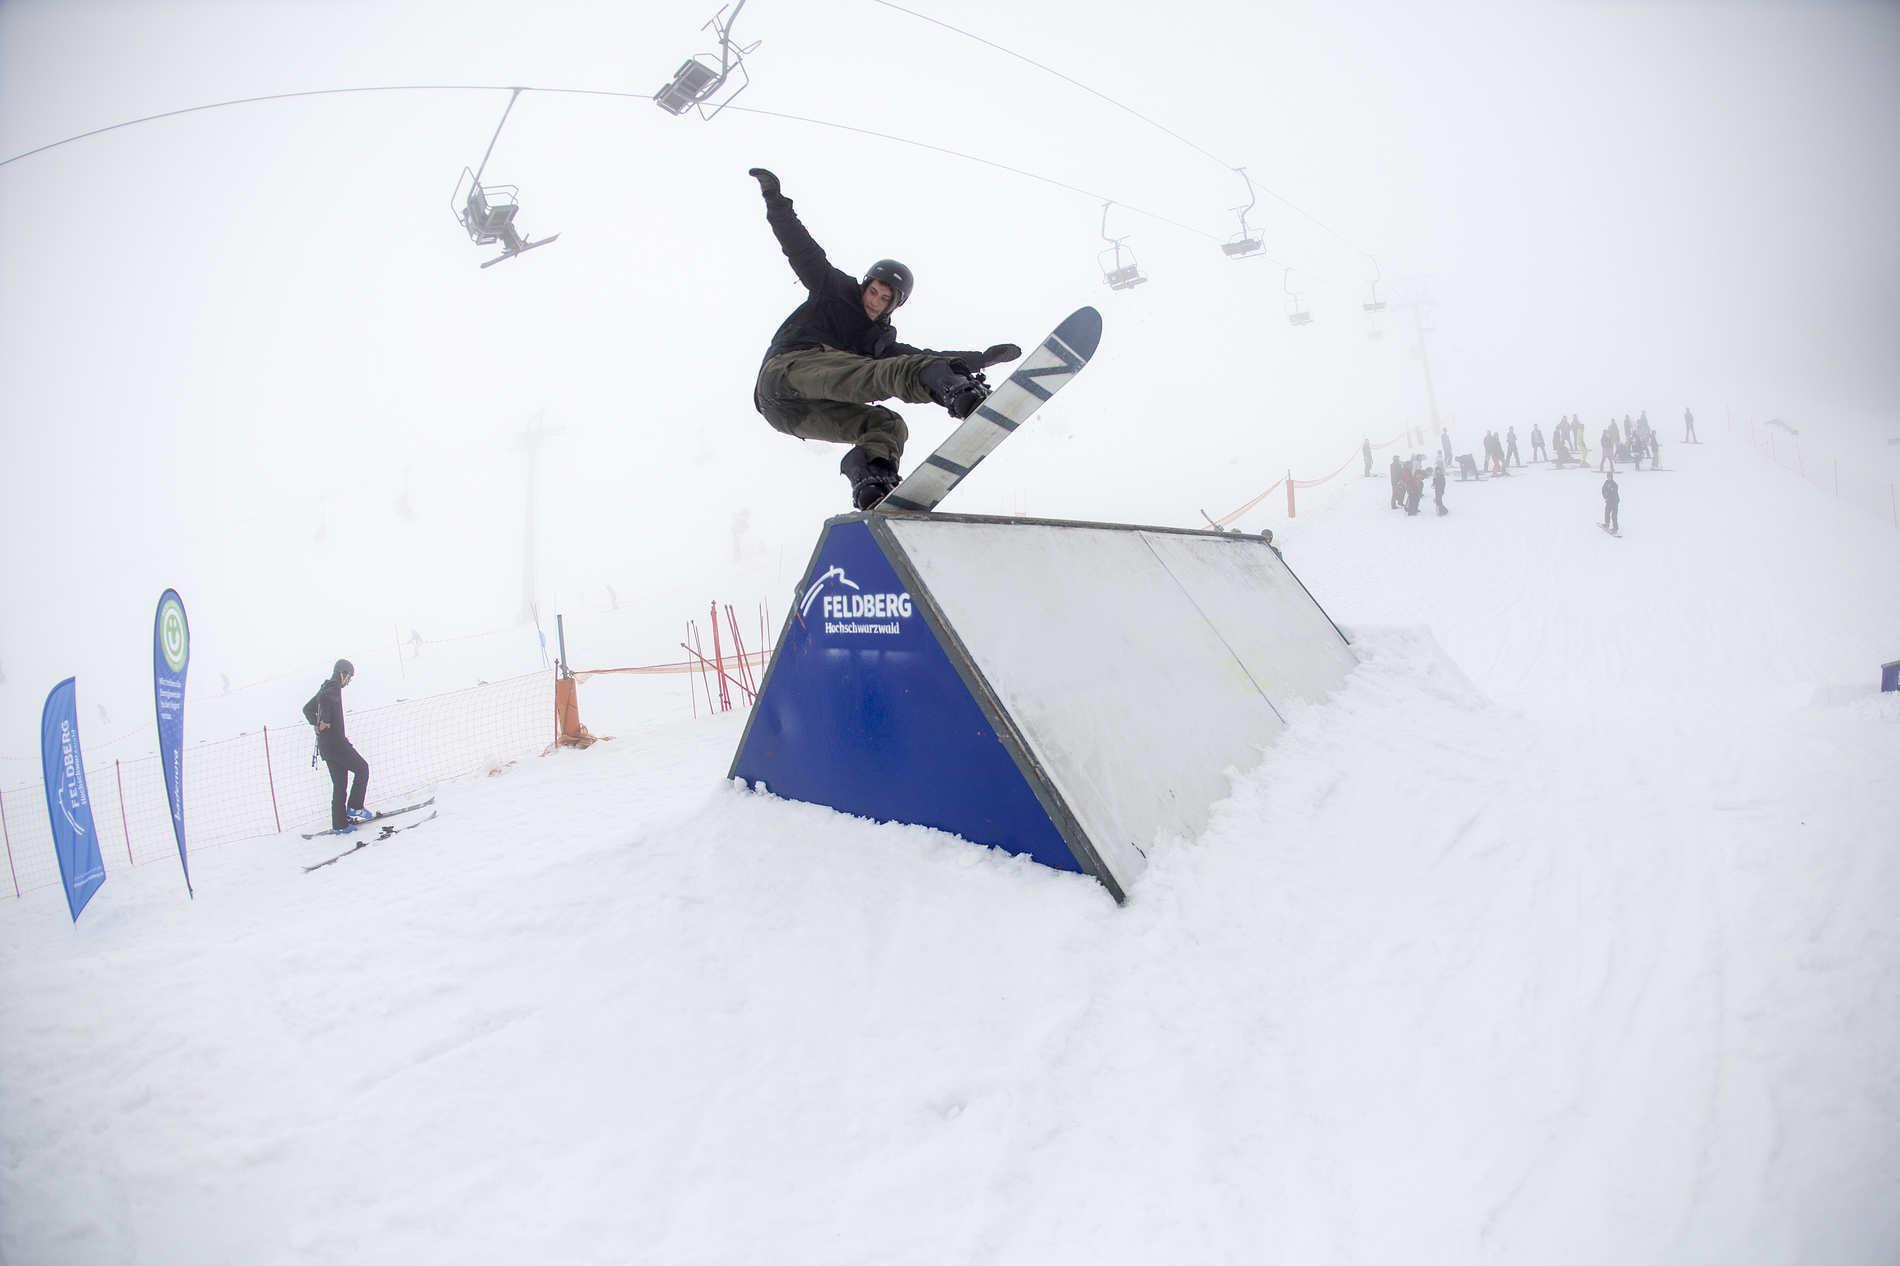 web snowpark feldberg 17 03 2018 action sb benjamin bartmann martin herrmann qparks 3